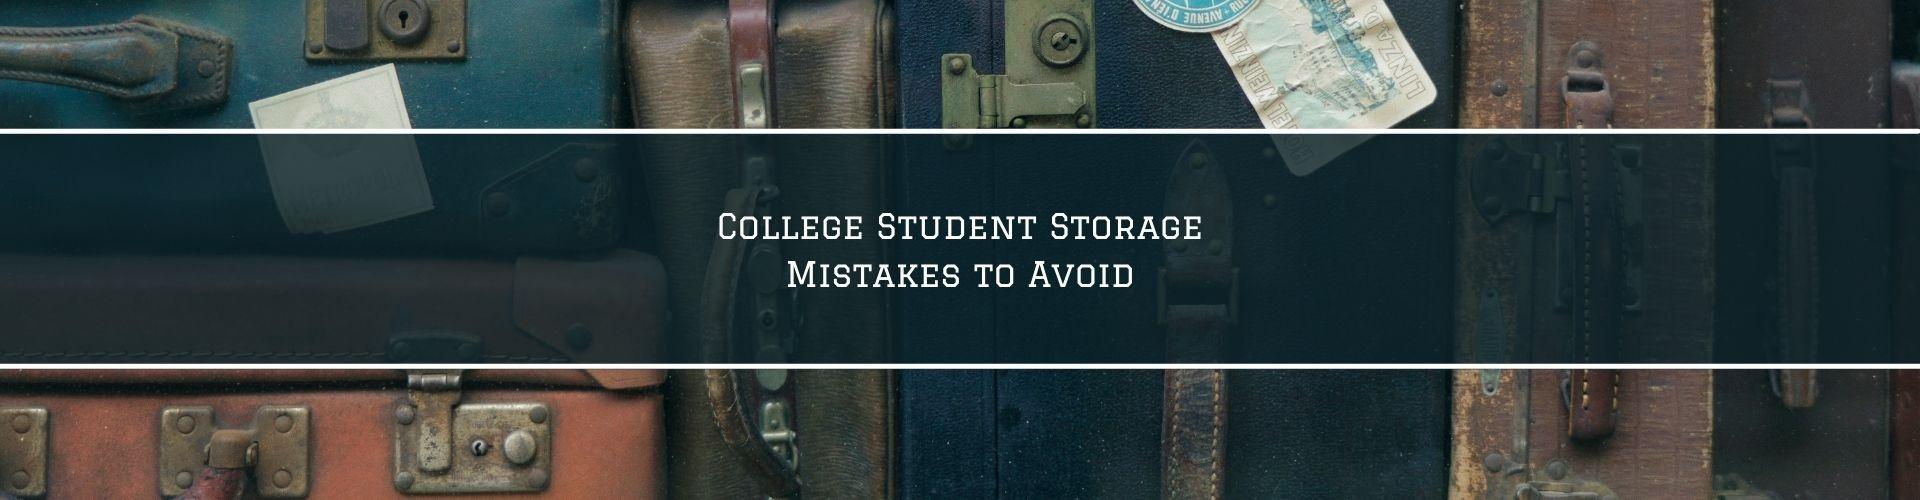 college student storage